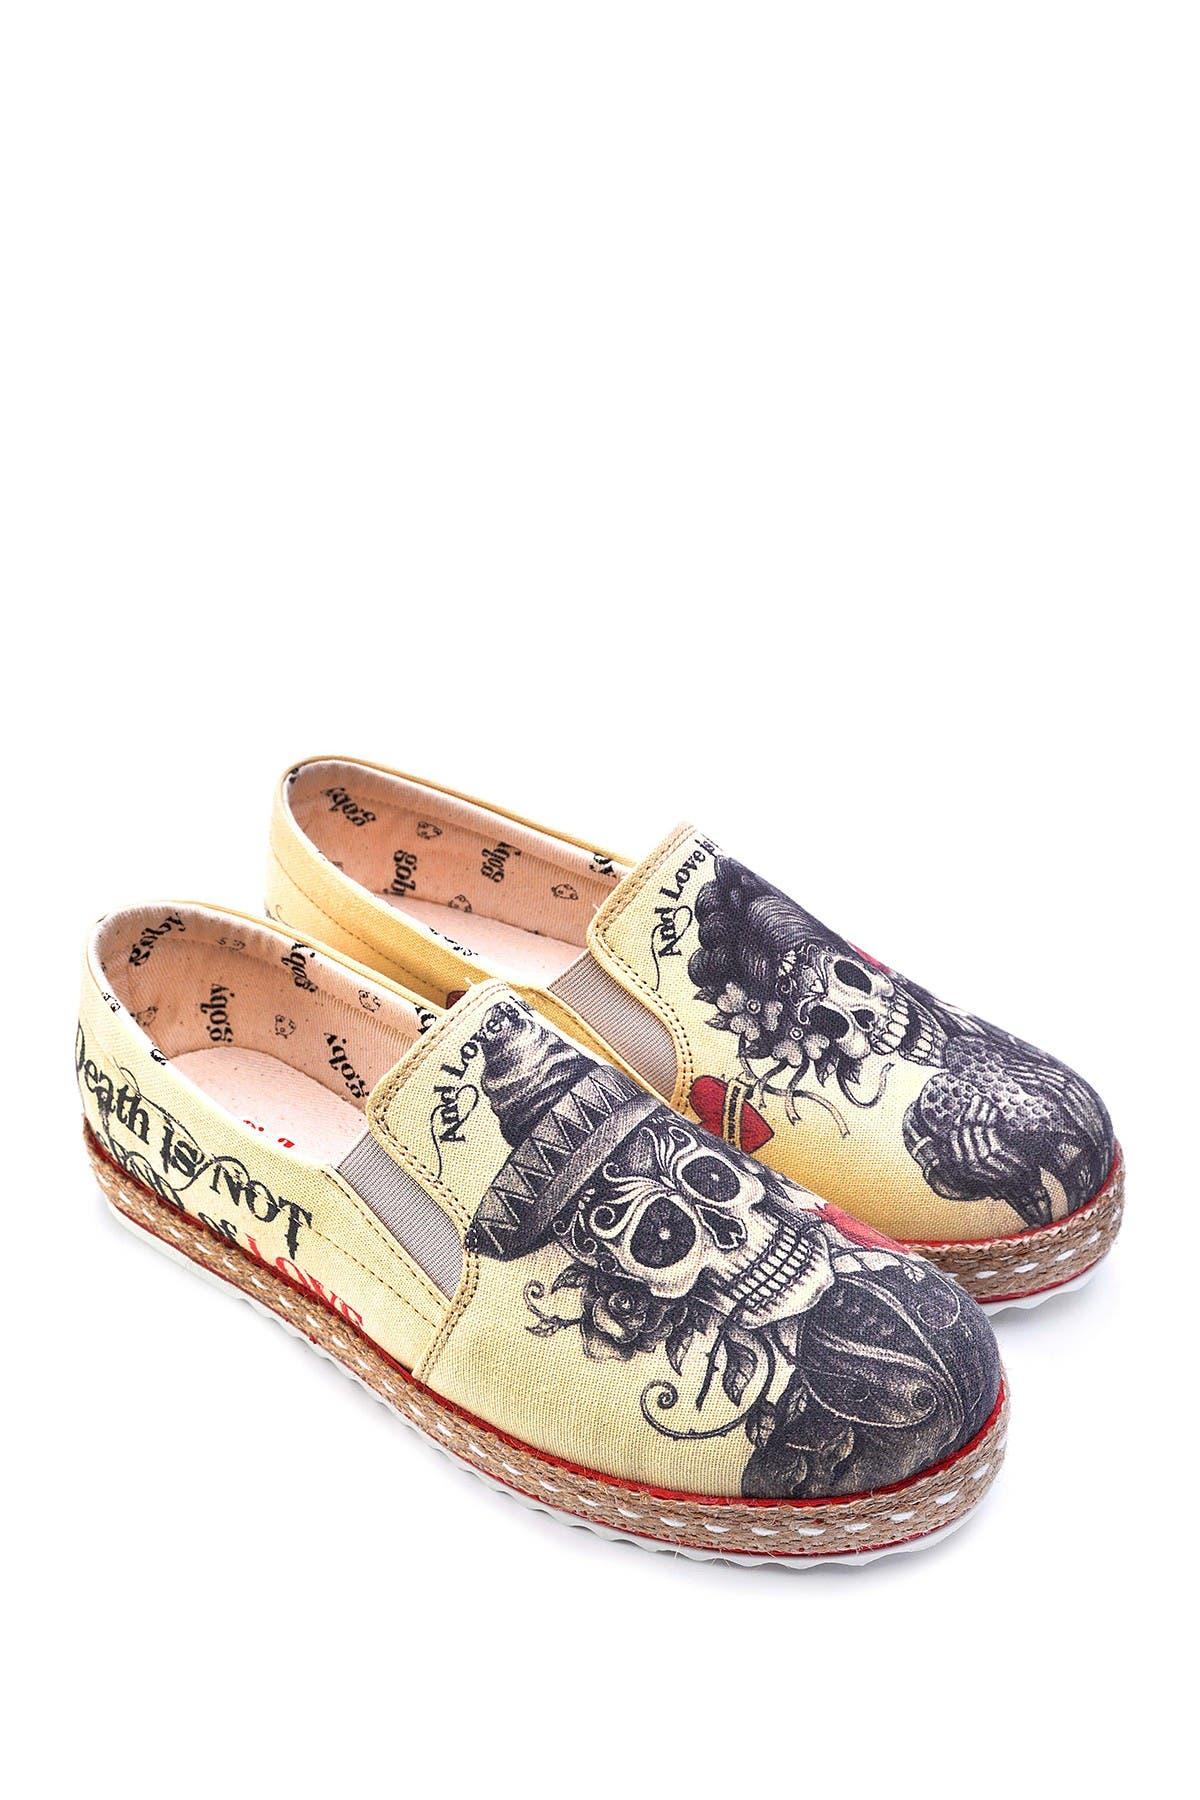 Image of Goby Sugar Skull Printed Platform Slip-On Sneaker